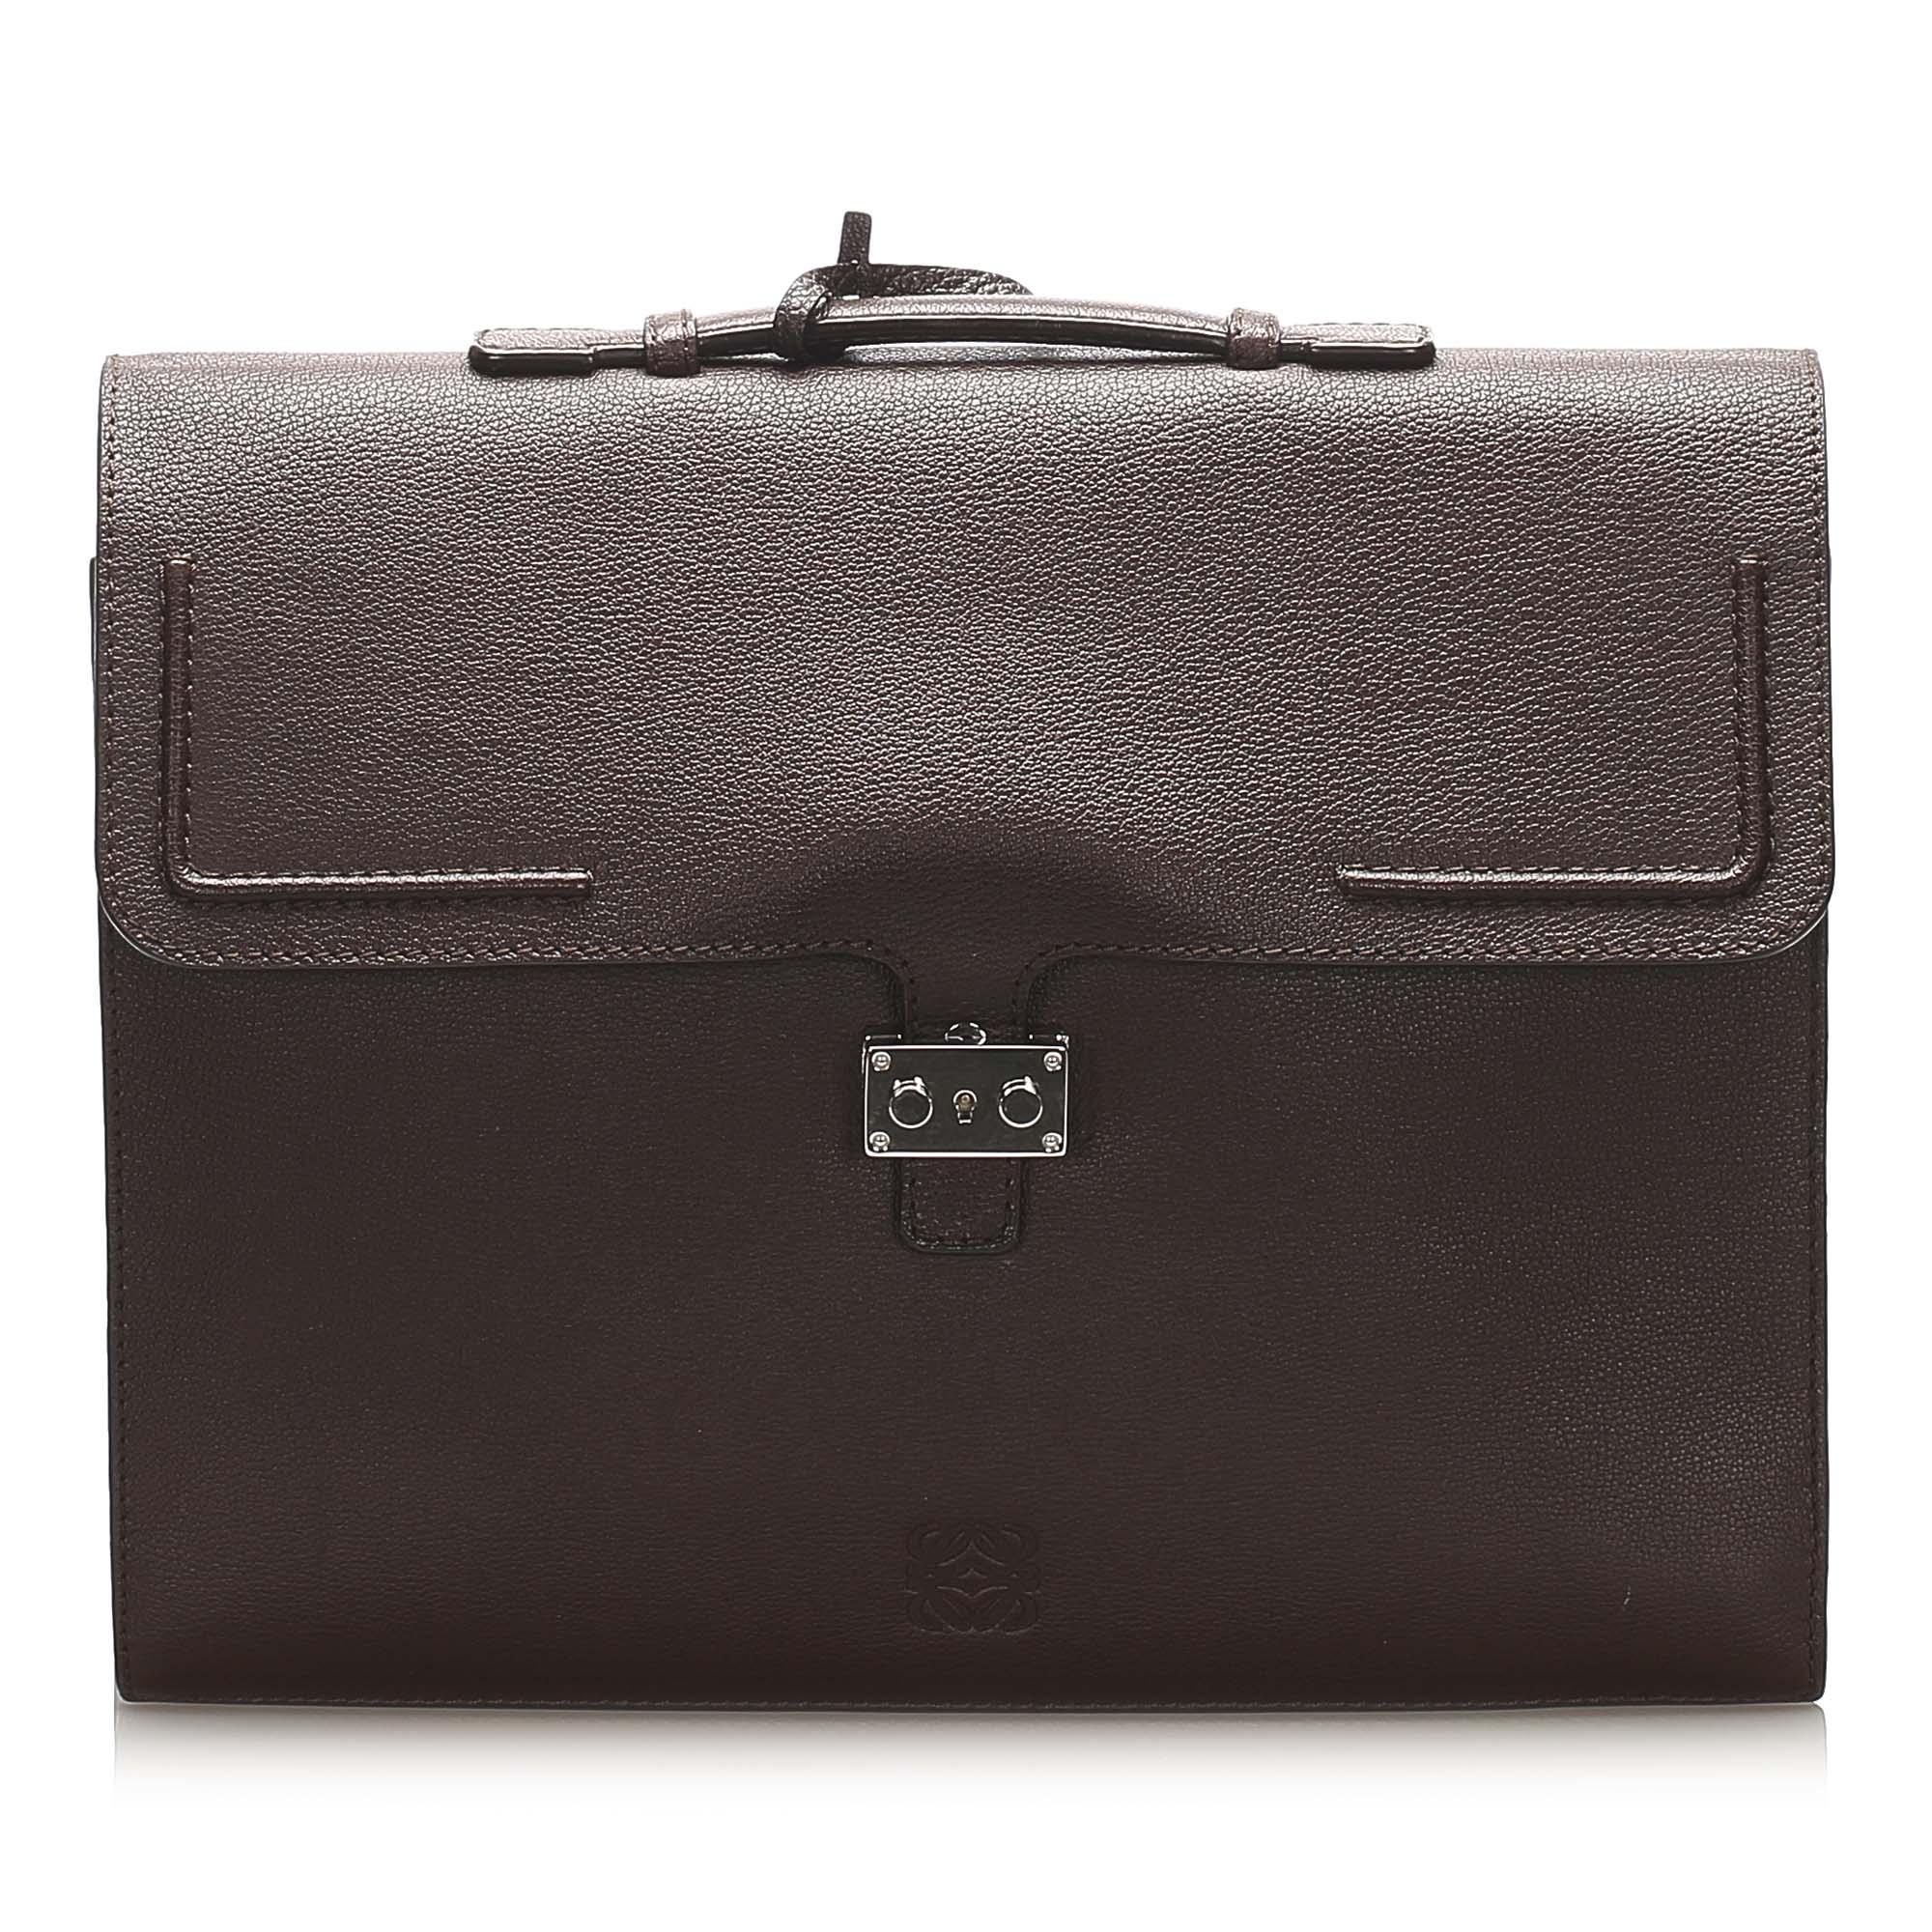 Porte documents, serviette LOEWE Brown